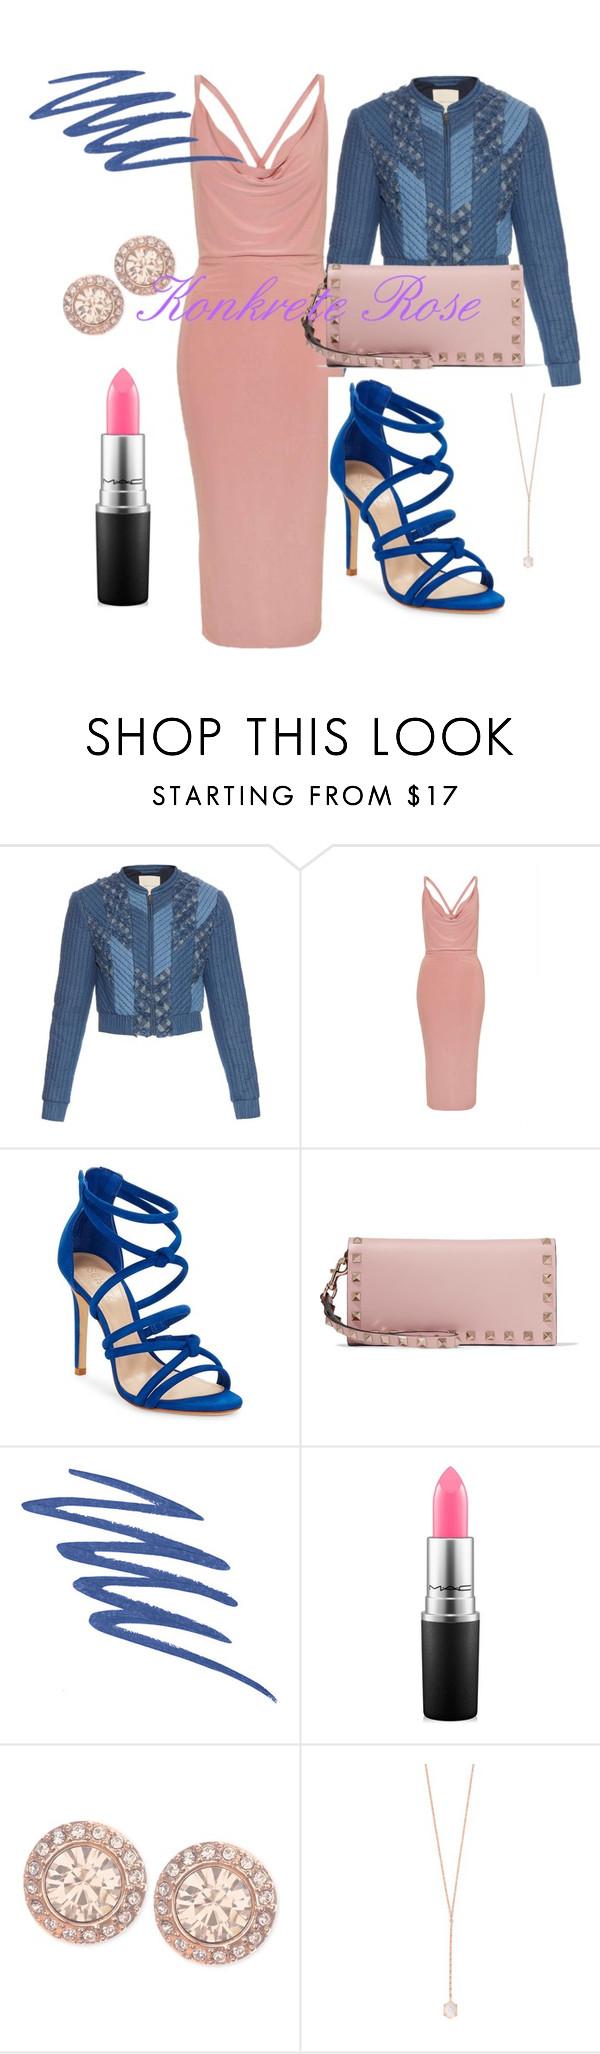 """Bomber Dress"" by konkreterose-kb on Polyvore featuring Rebecca Taylor, Topshop, Schutz, Valentino, NARS Cosmetics, MAC Cosmetics, Givenchy and Samantha Wills"